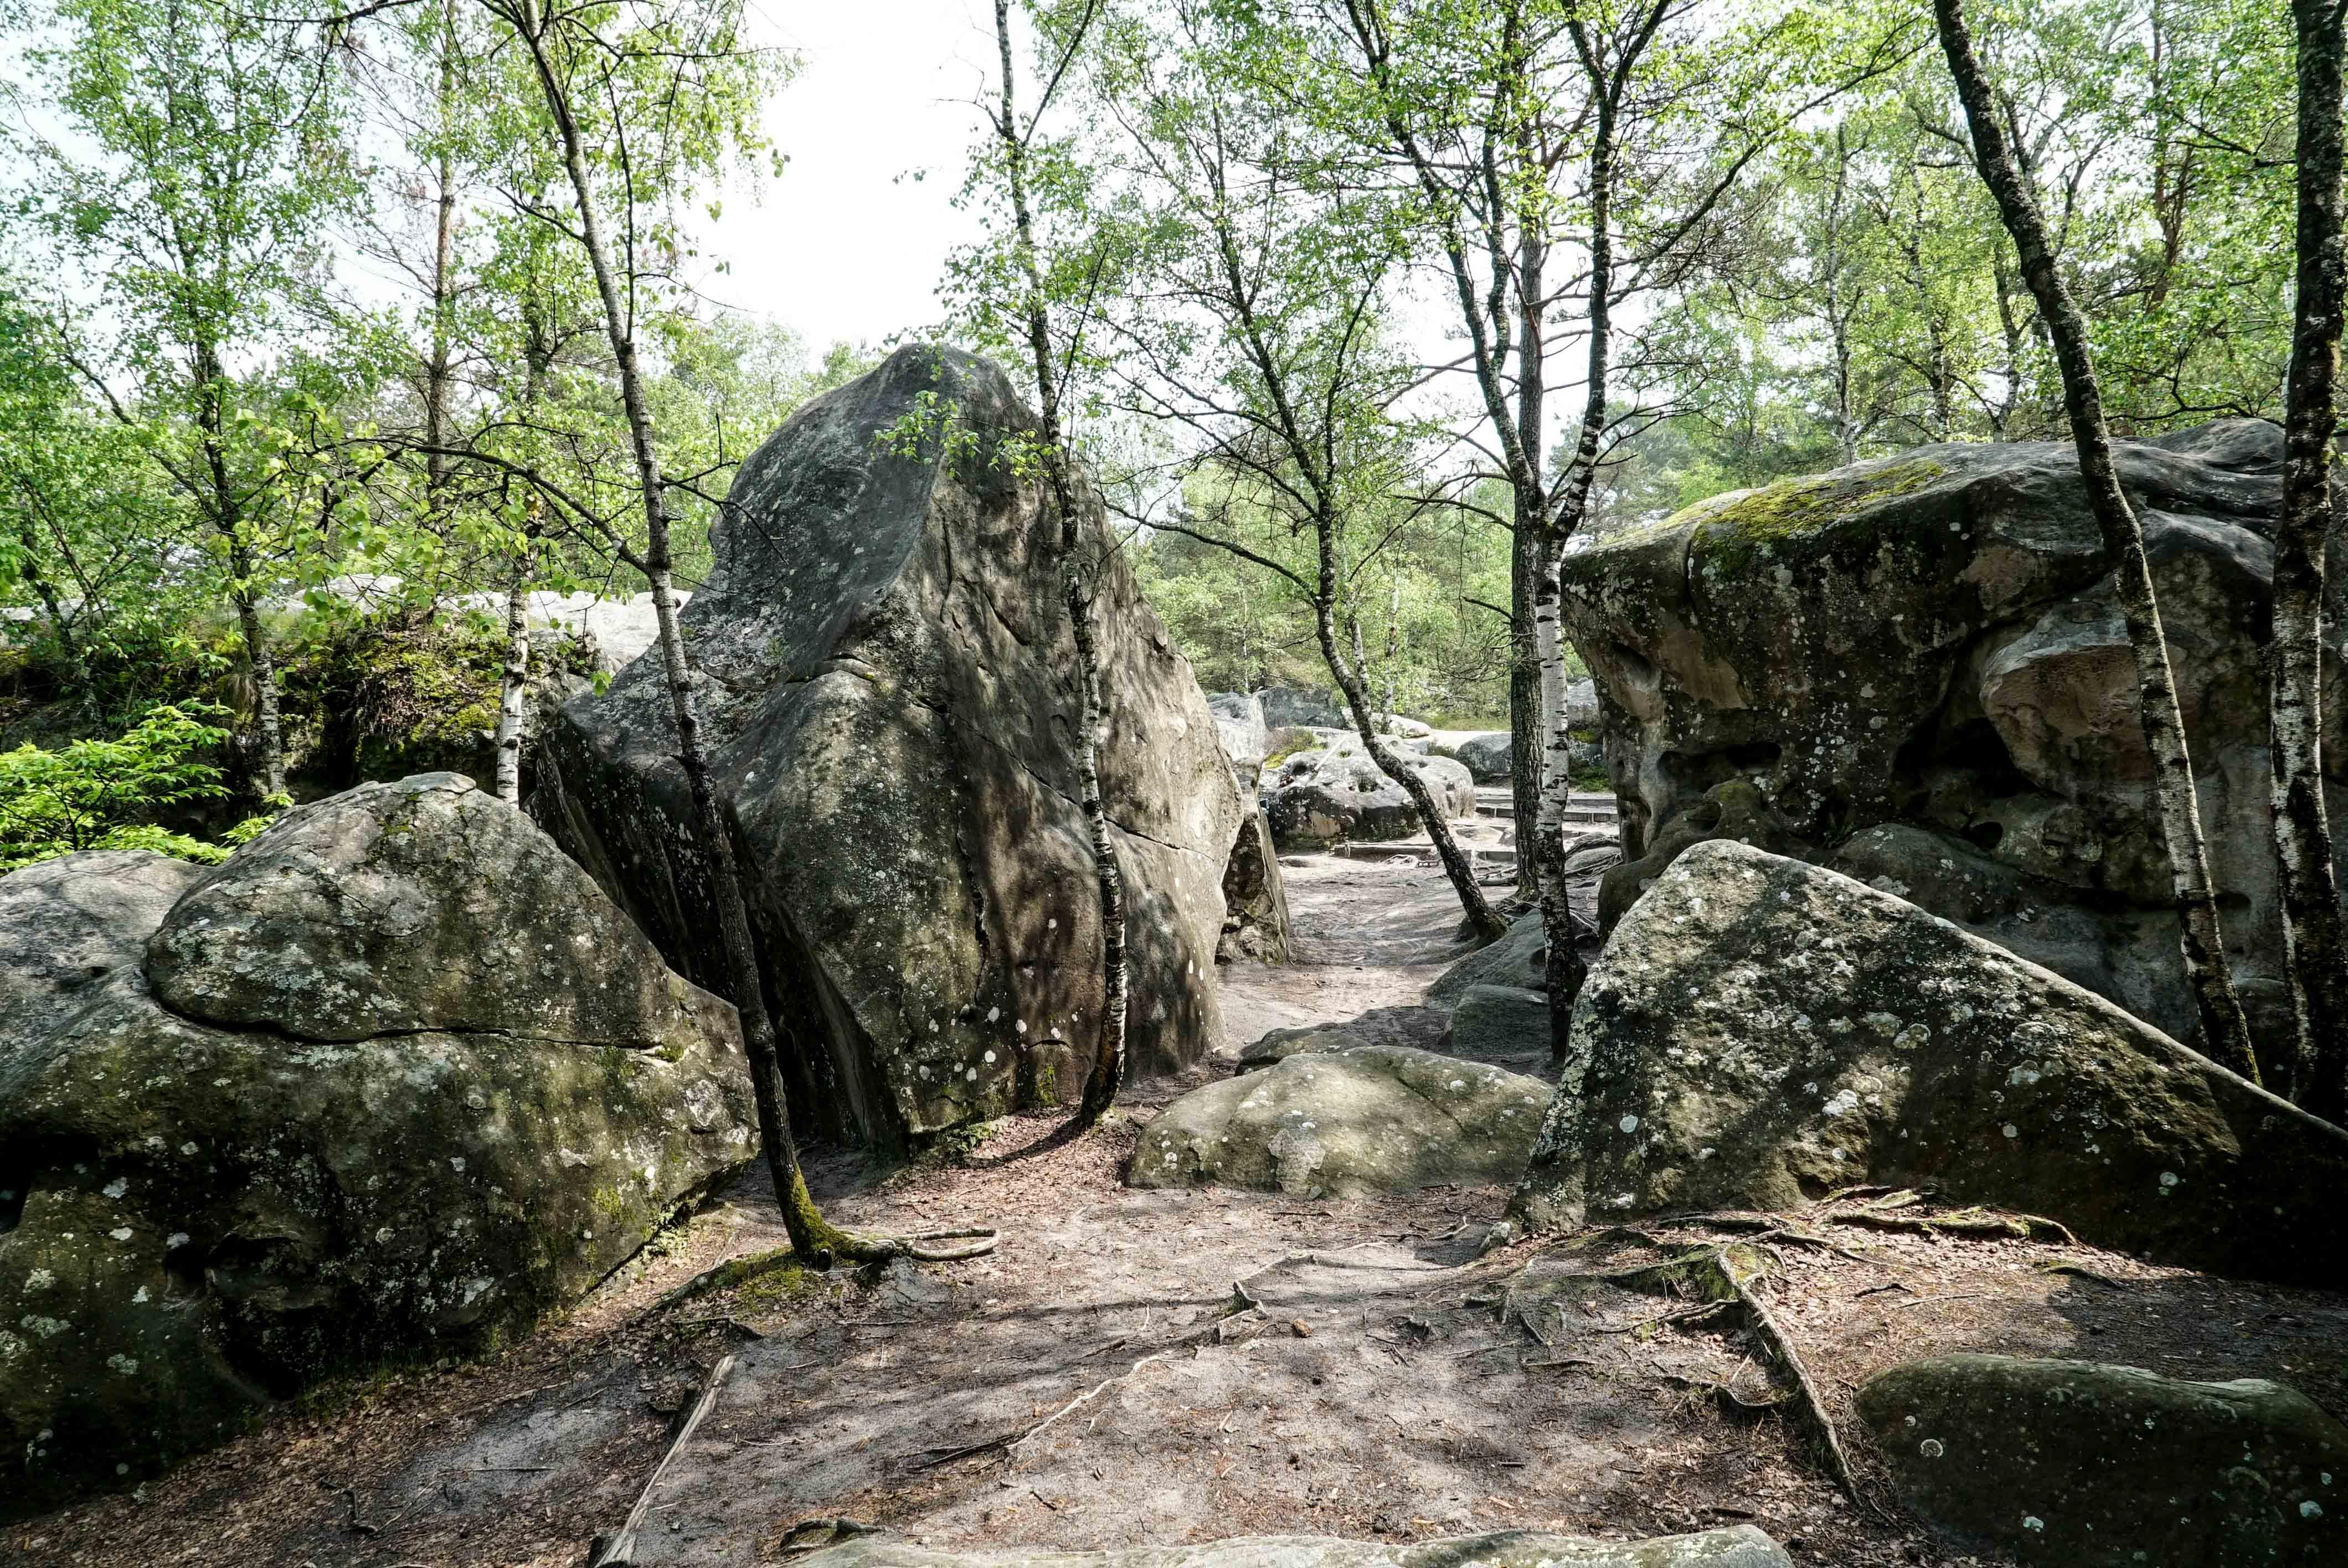 fontainbleau climbing 2016 mike brindley-67